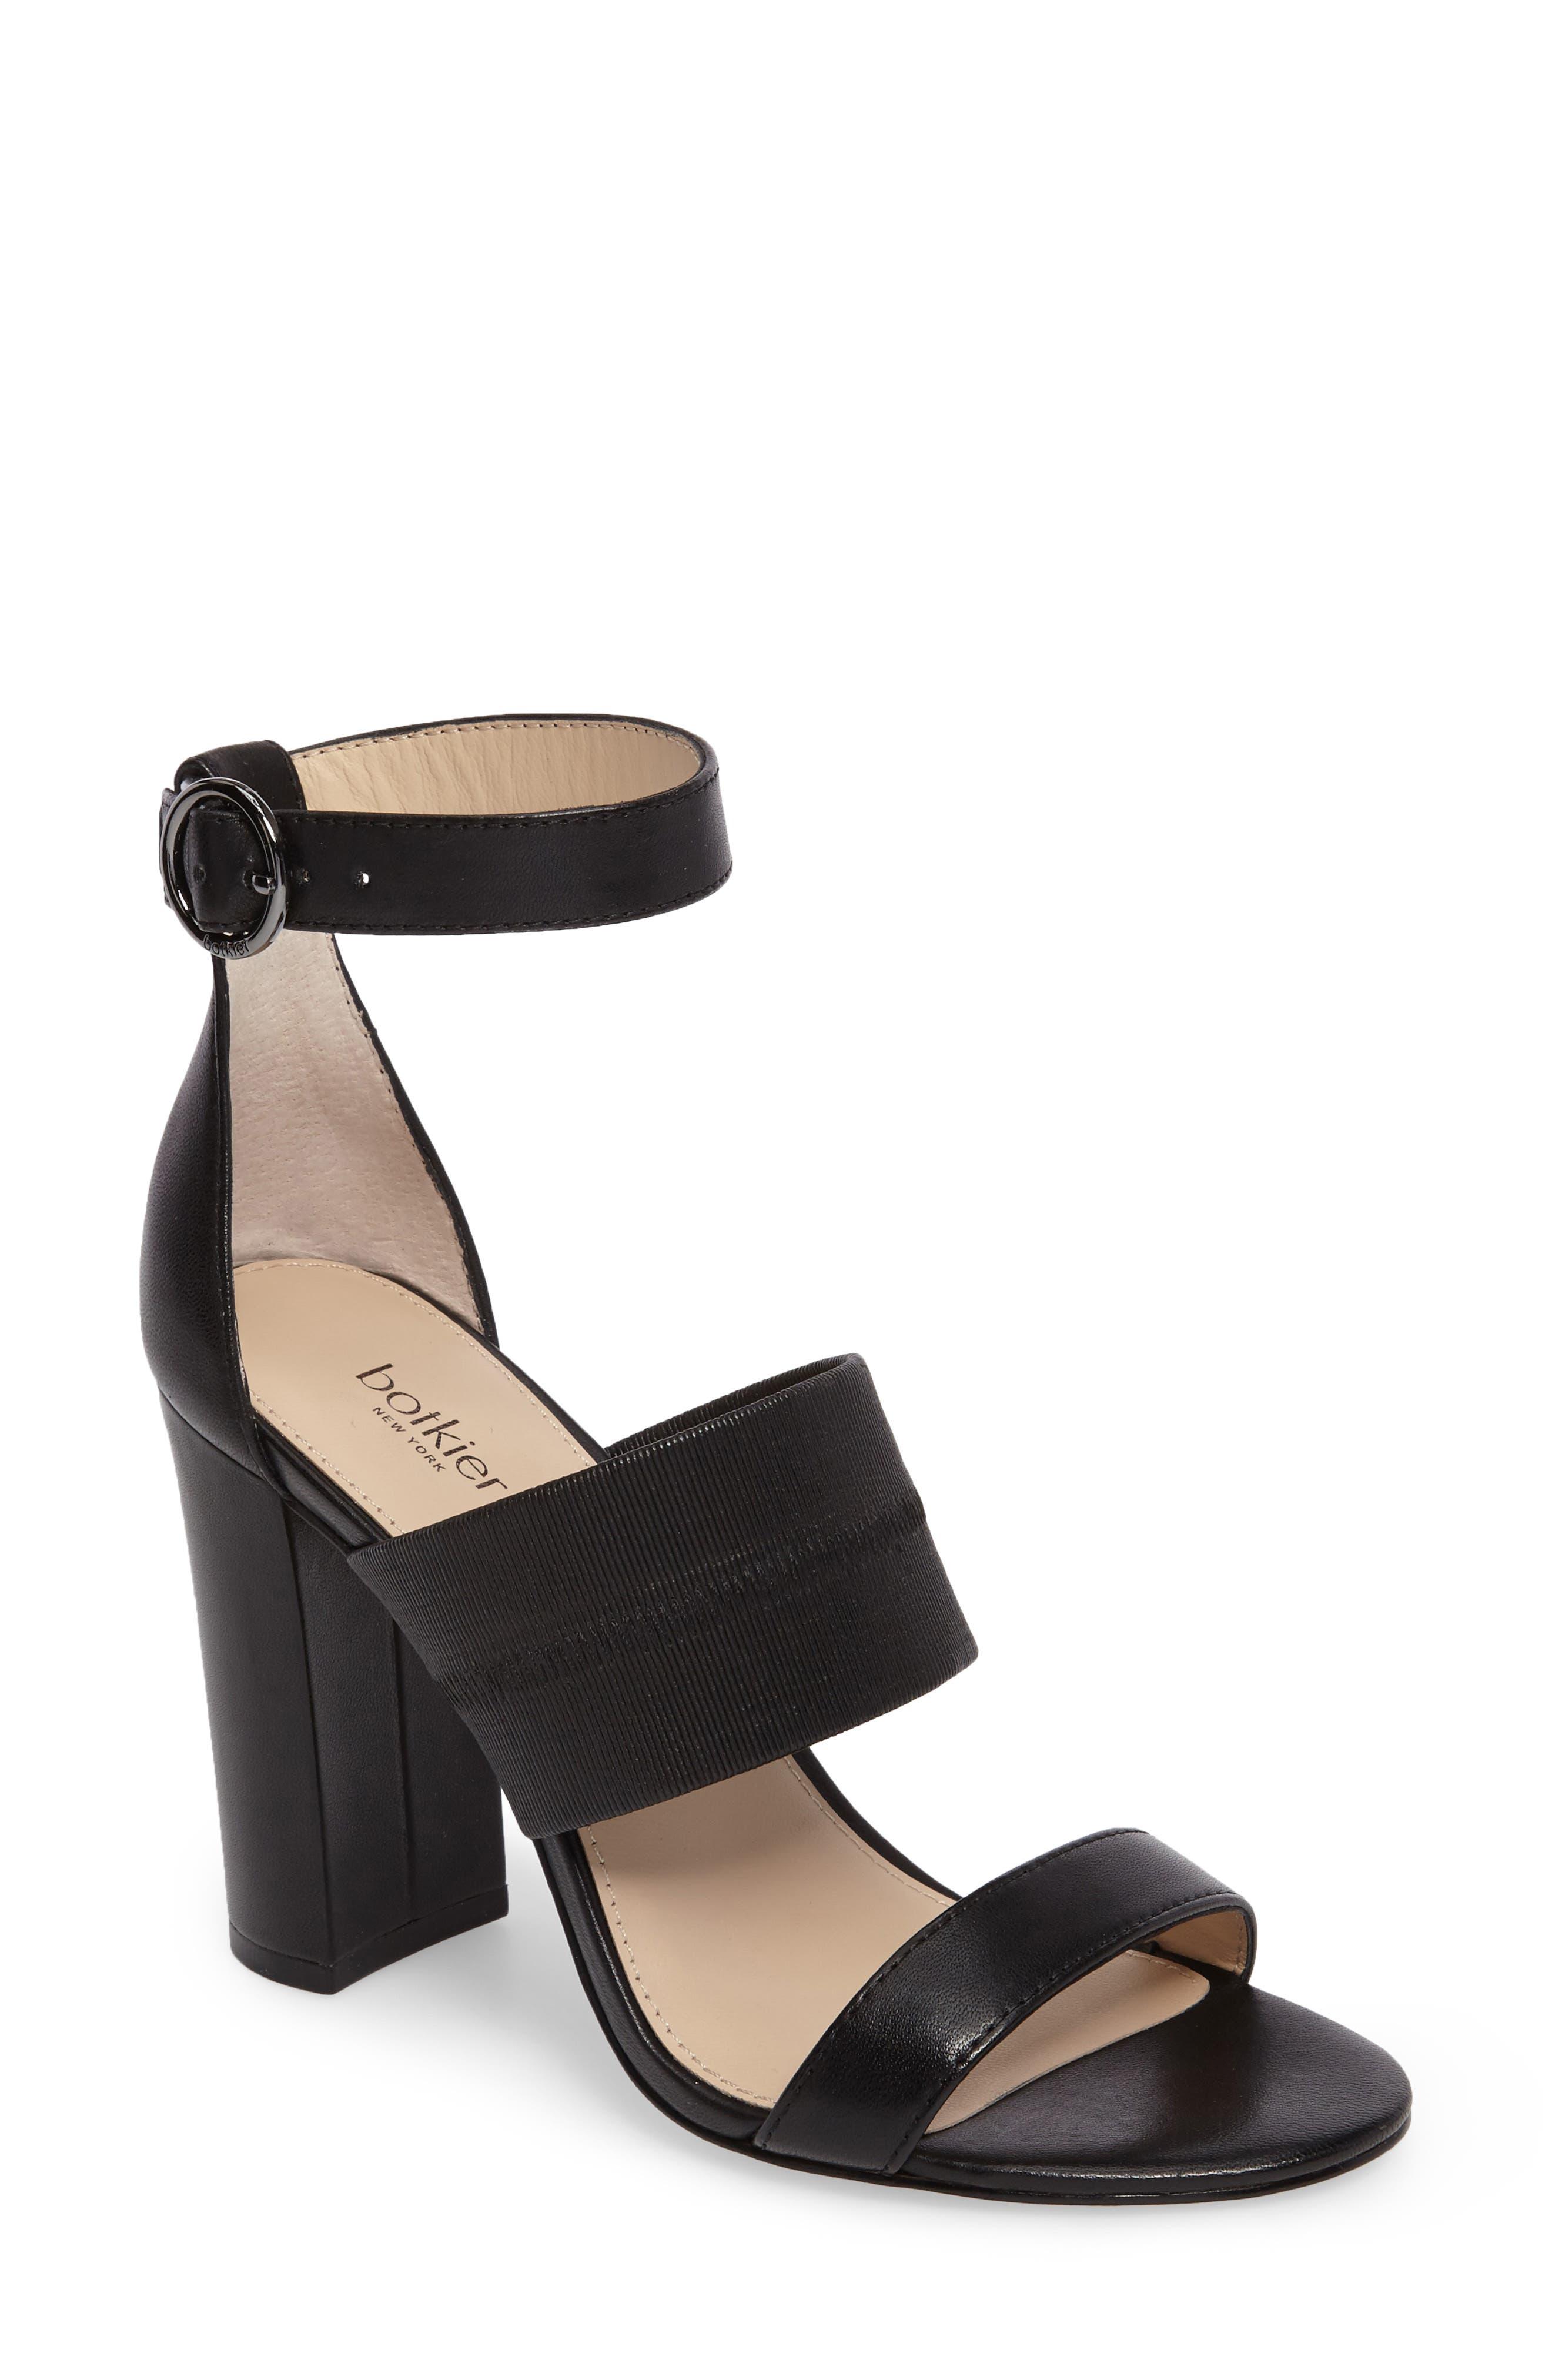 Gisella Ankle Strap Sandal,                         Main,                         color, Black Leather